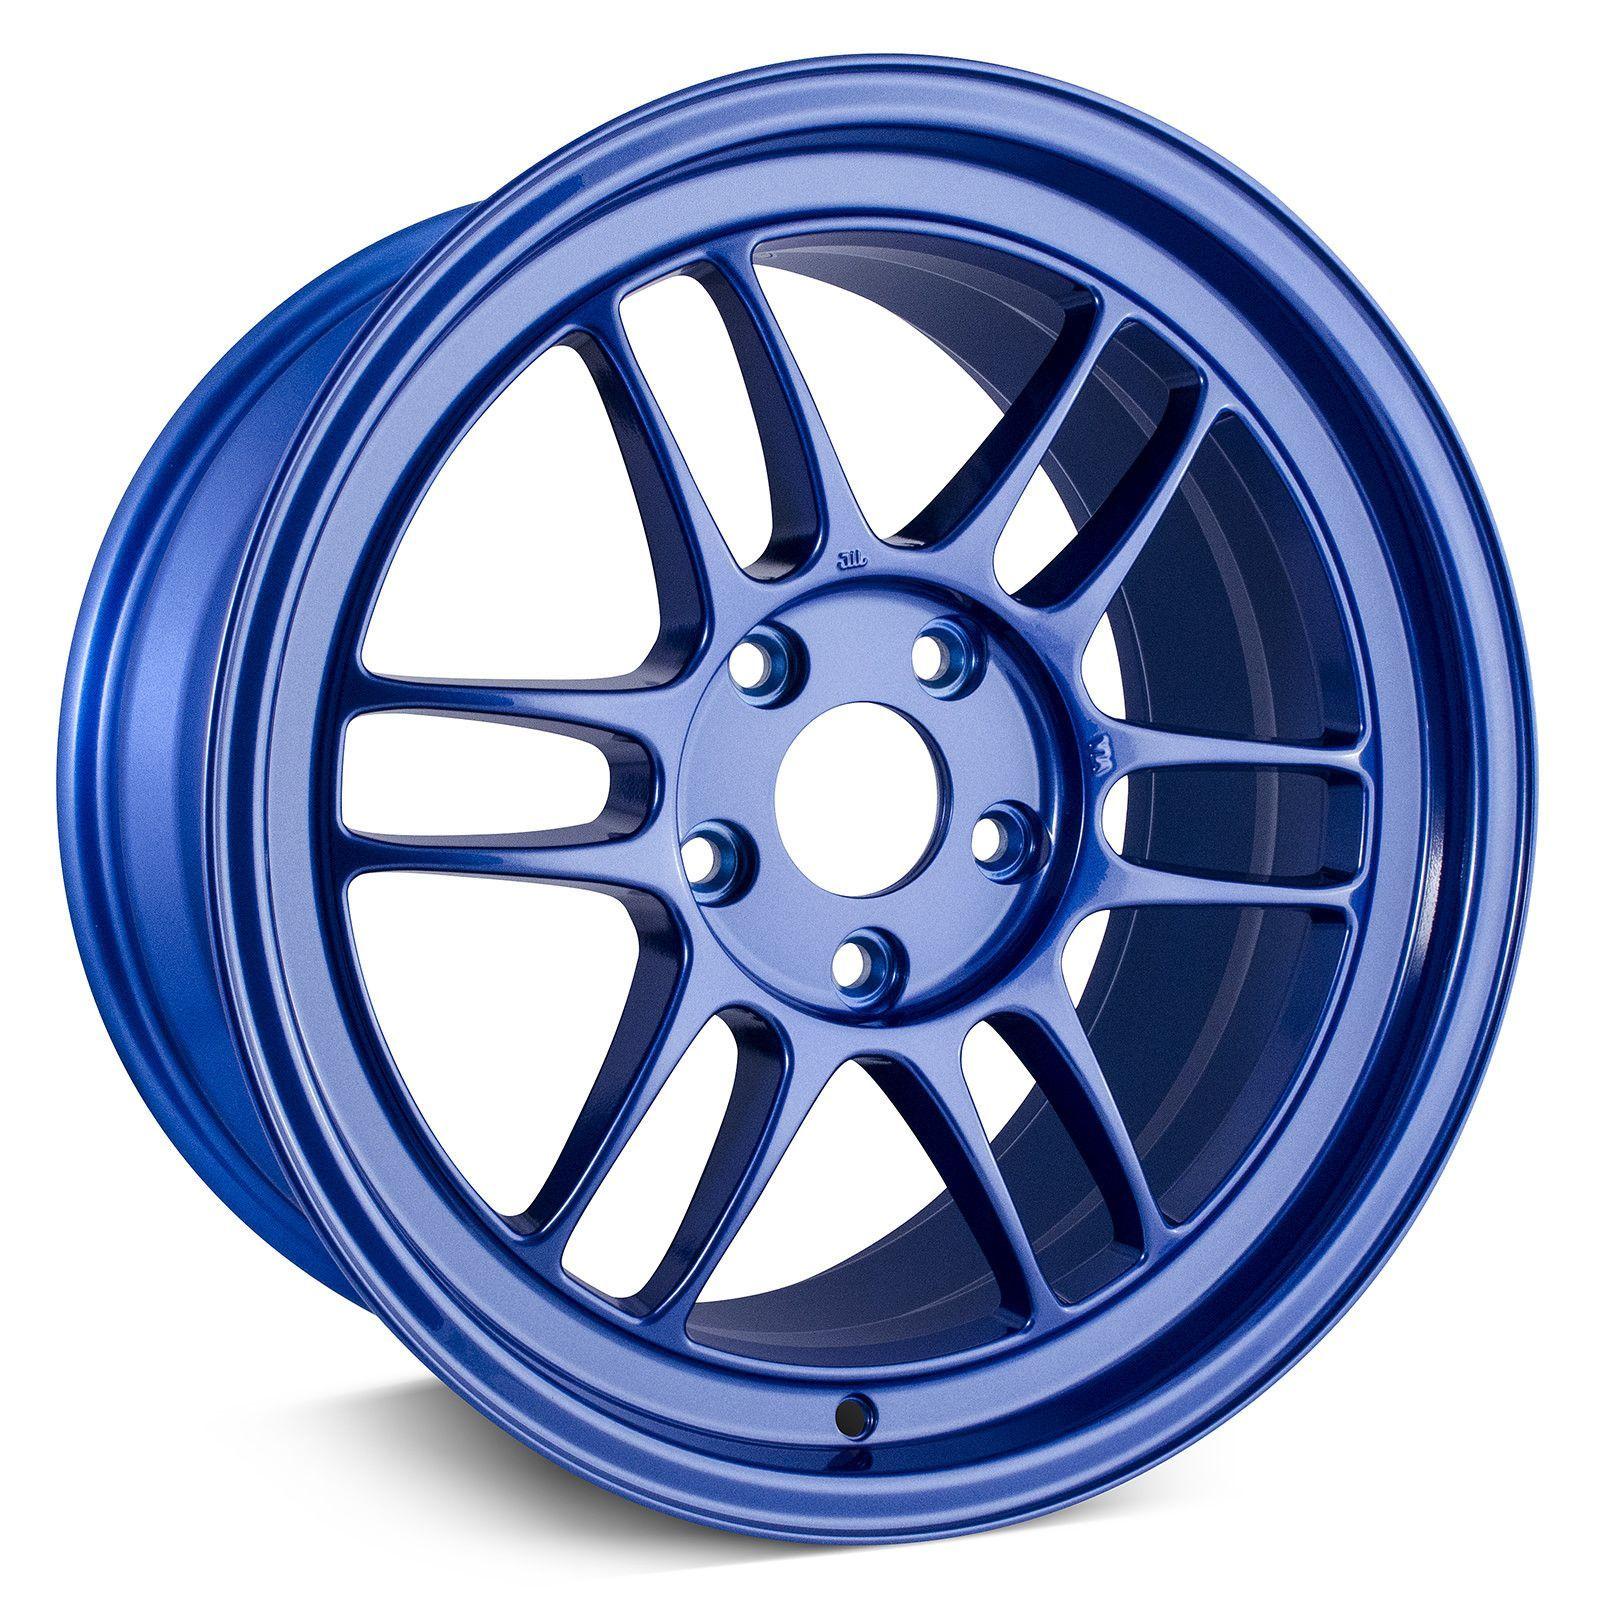 Enkei rpf1 blue wheel 17x9 rim size 5x1143 bolt